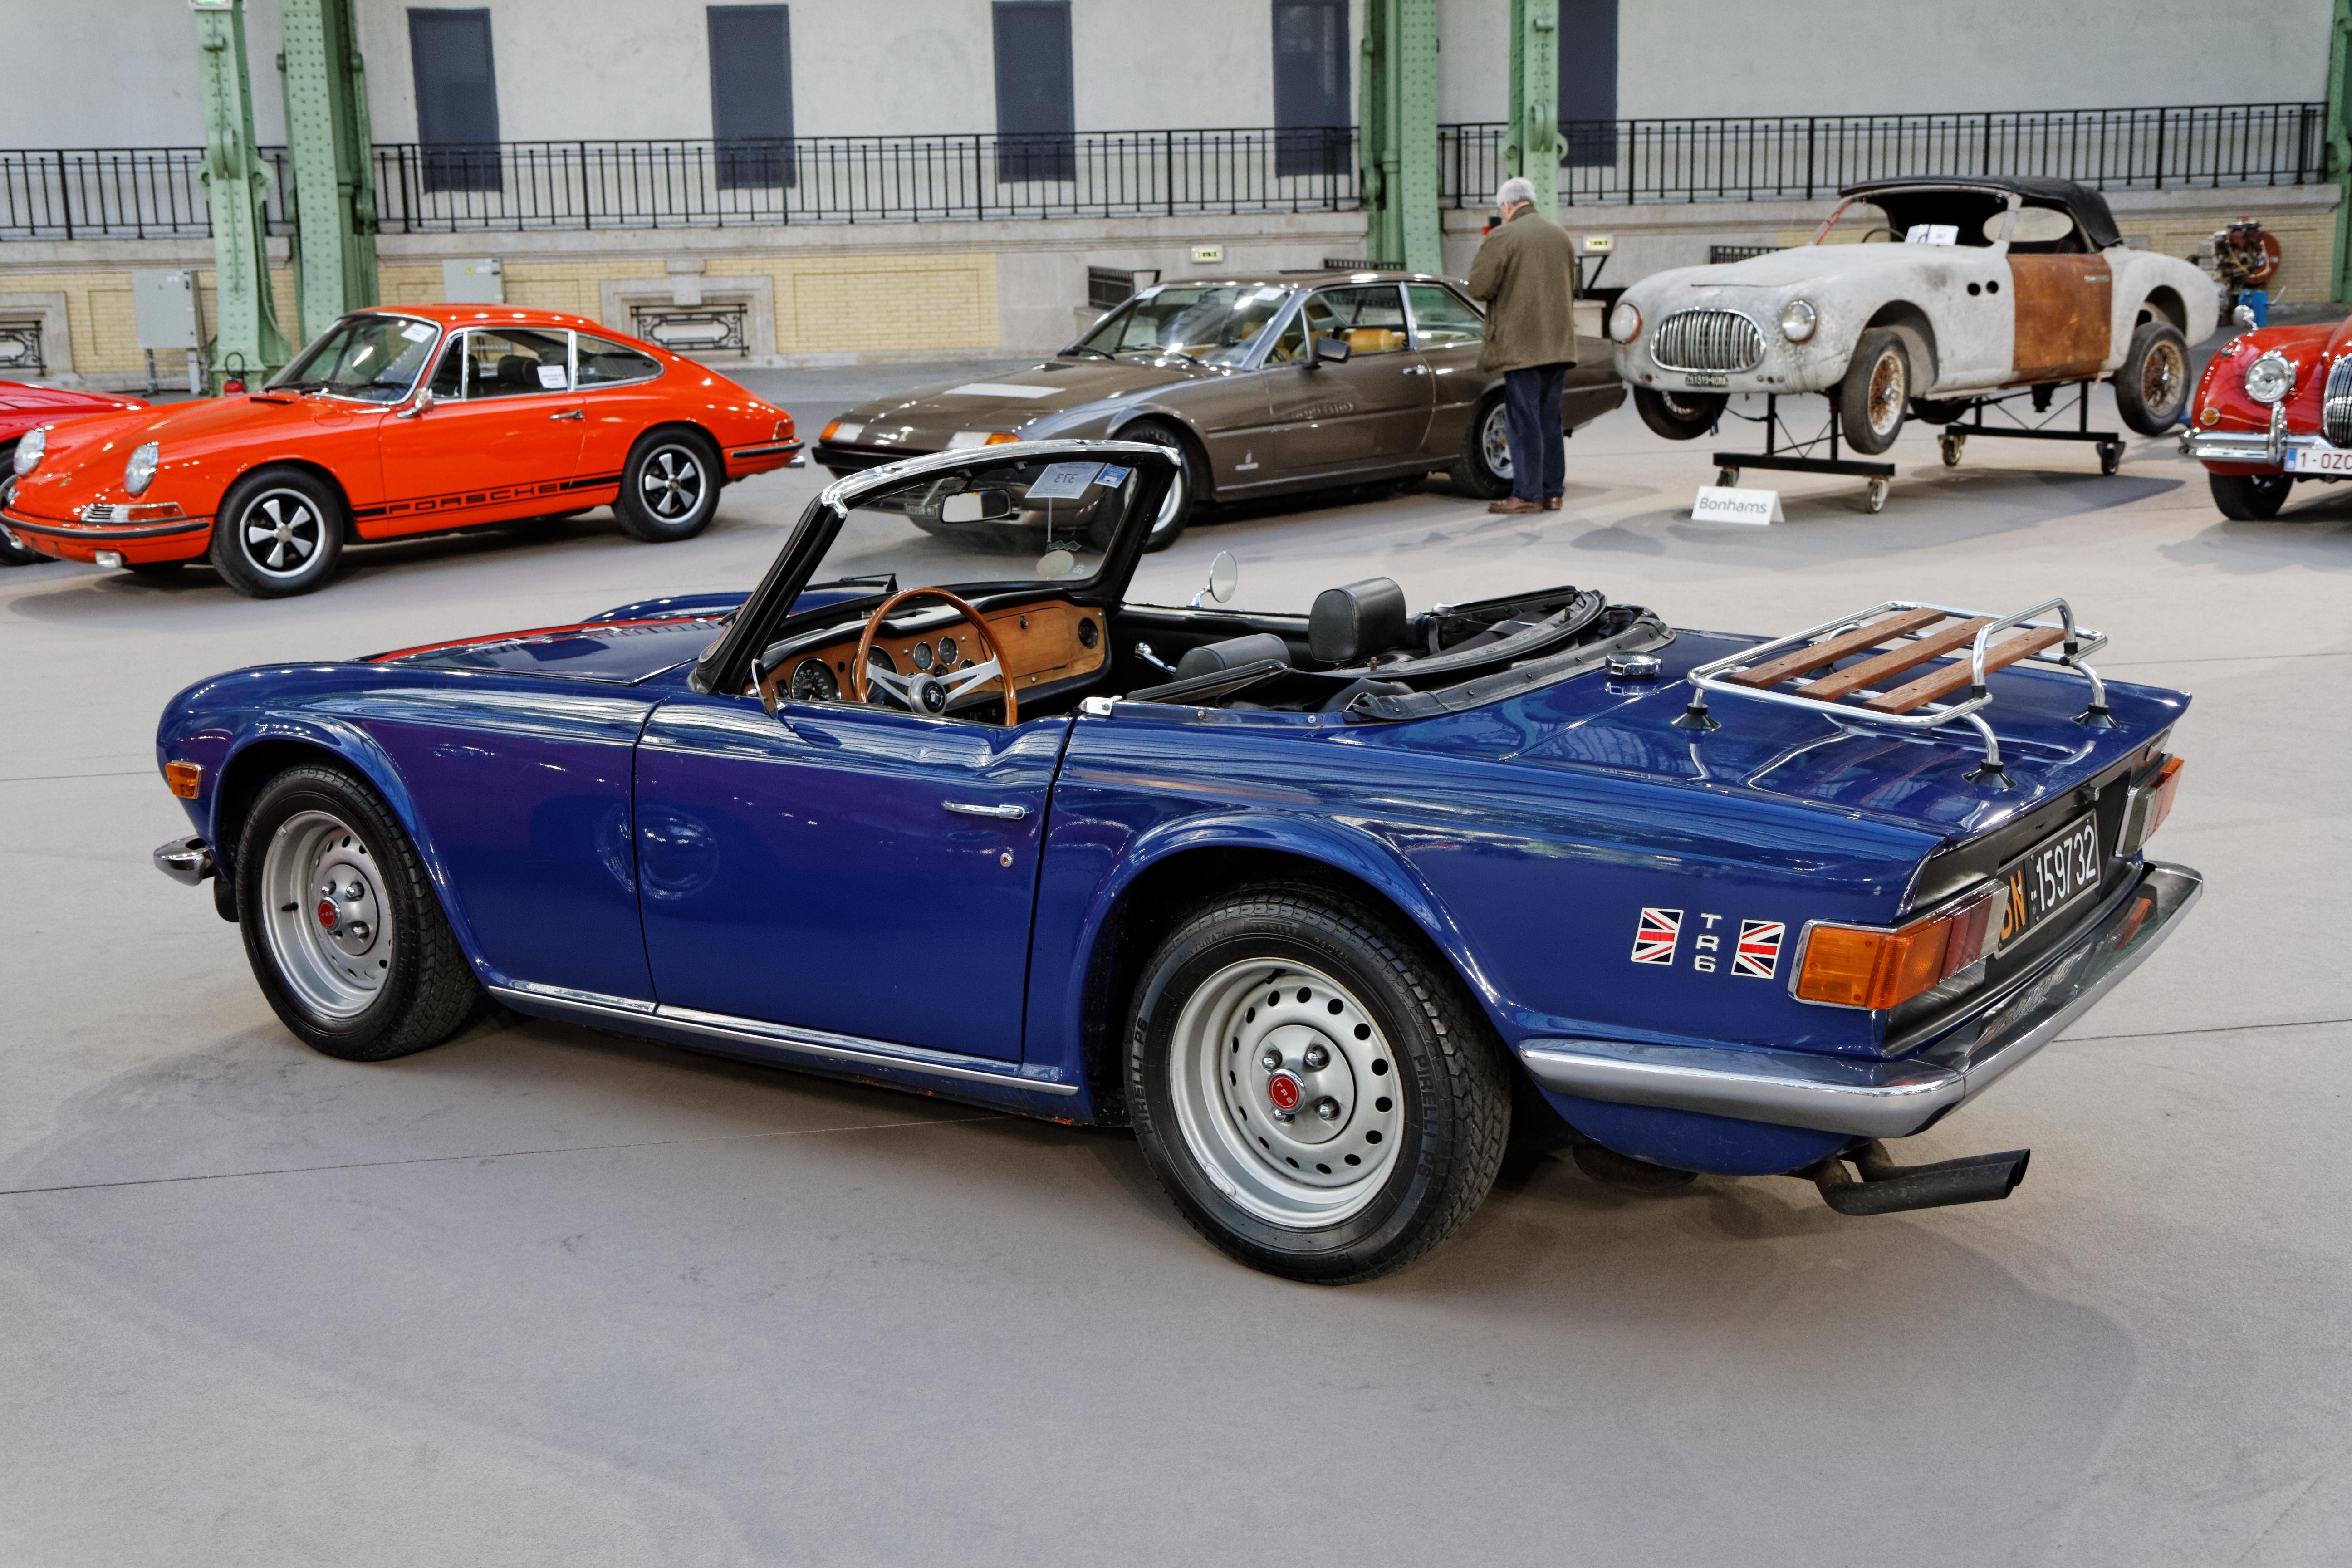 File:Paris - Bonhams 2014 - Triumph TR6 Roadster - 1974 - 004 jpg